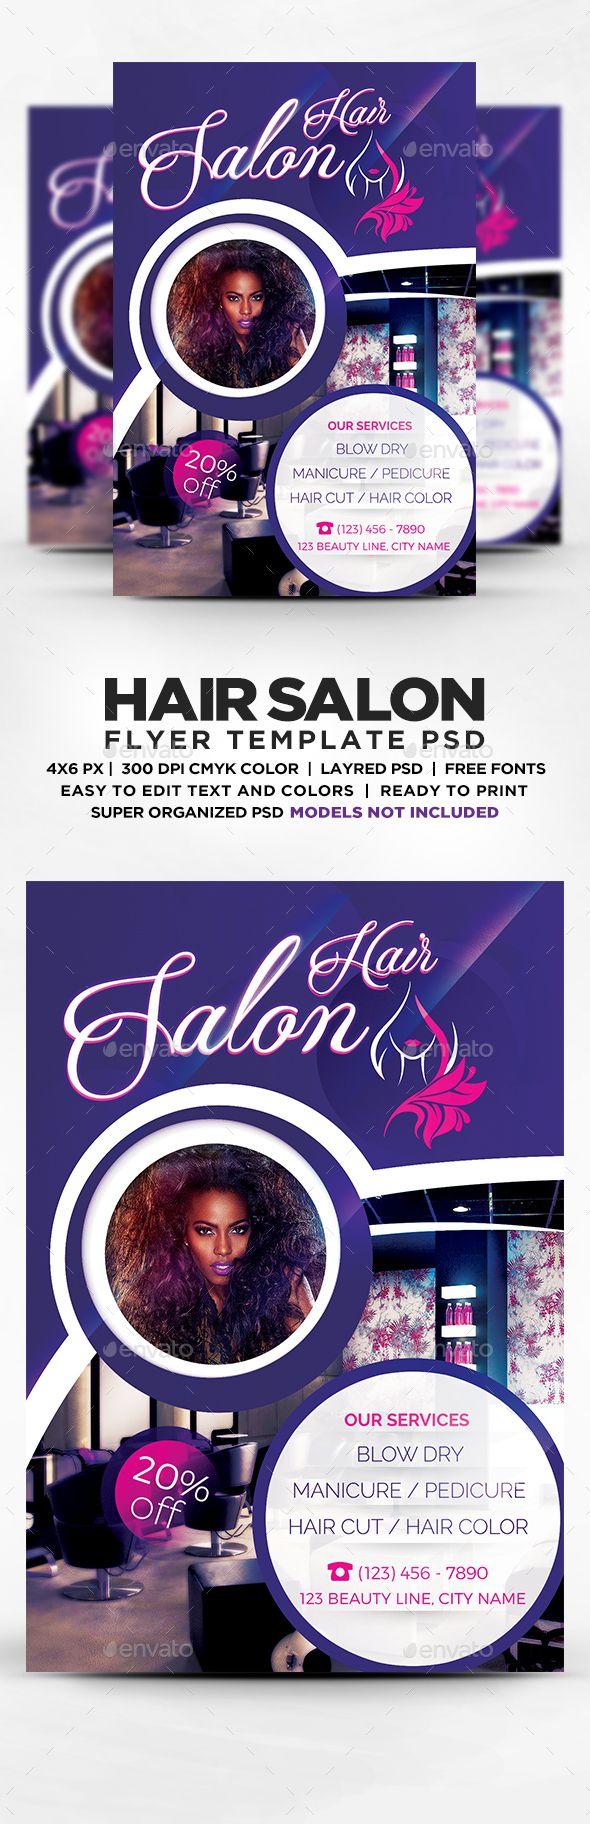 Beauty Hair Salon Flyer Template PSD   Flyers Print Templates